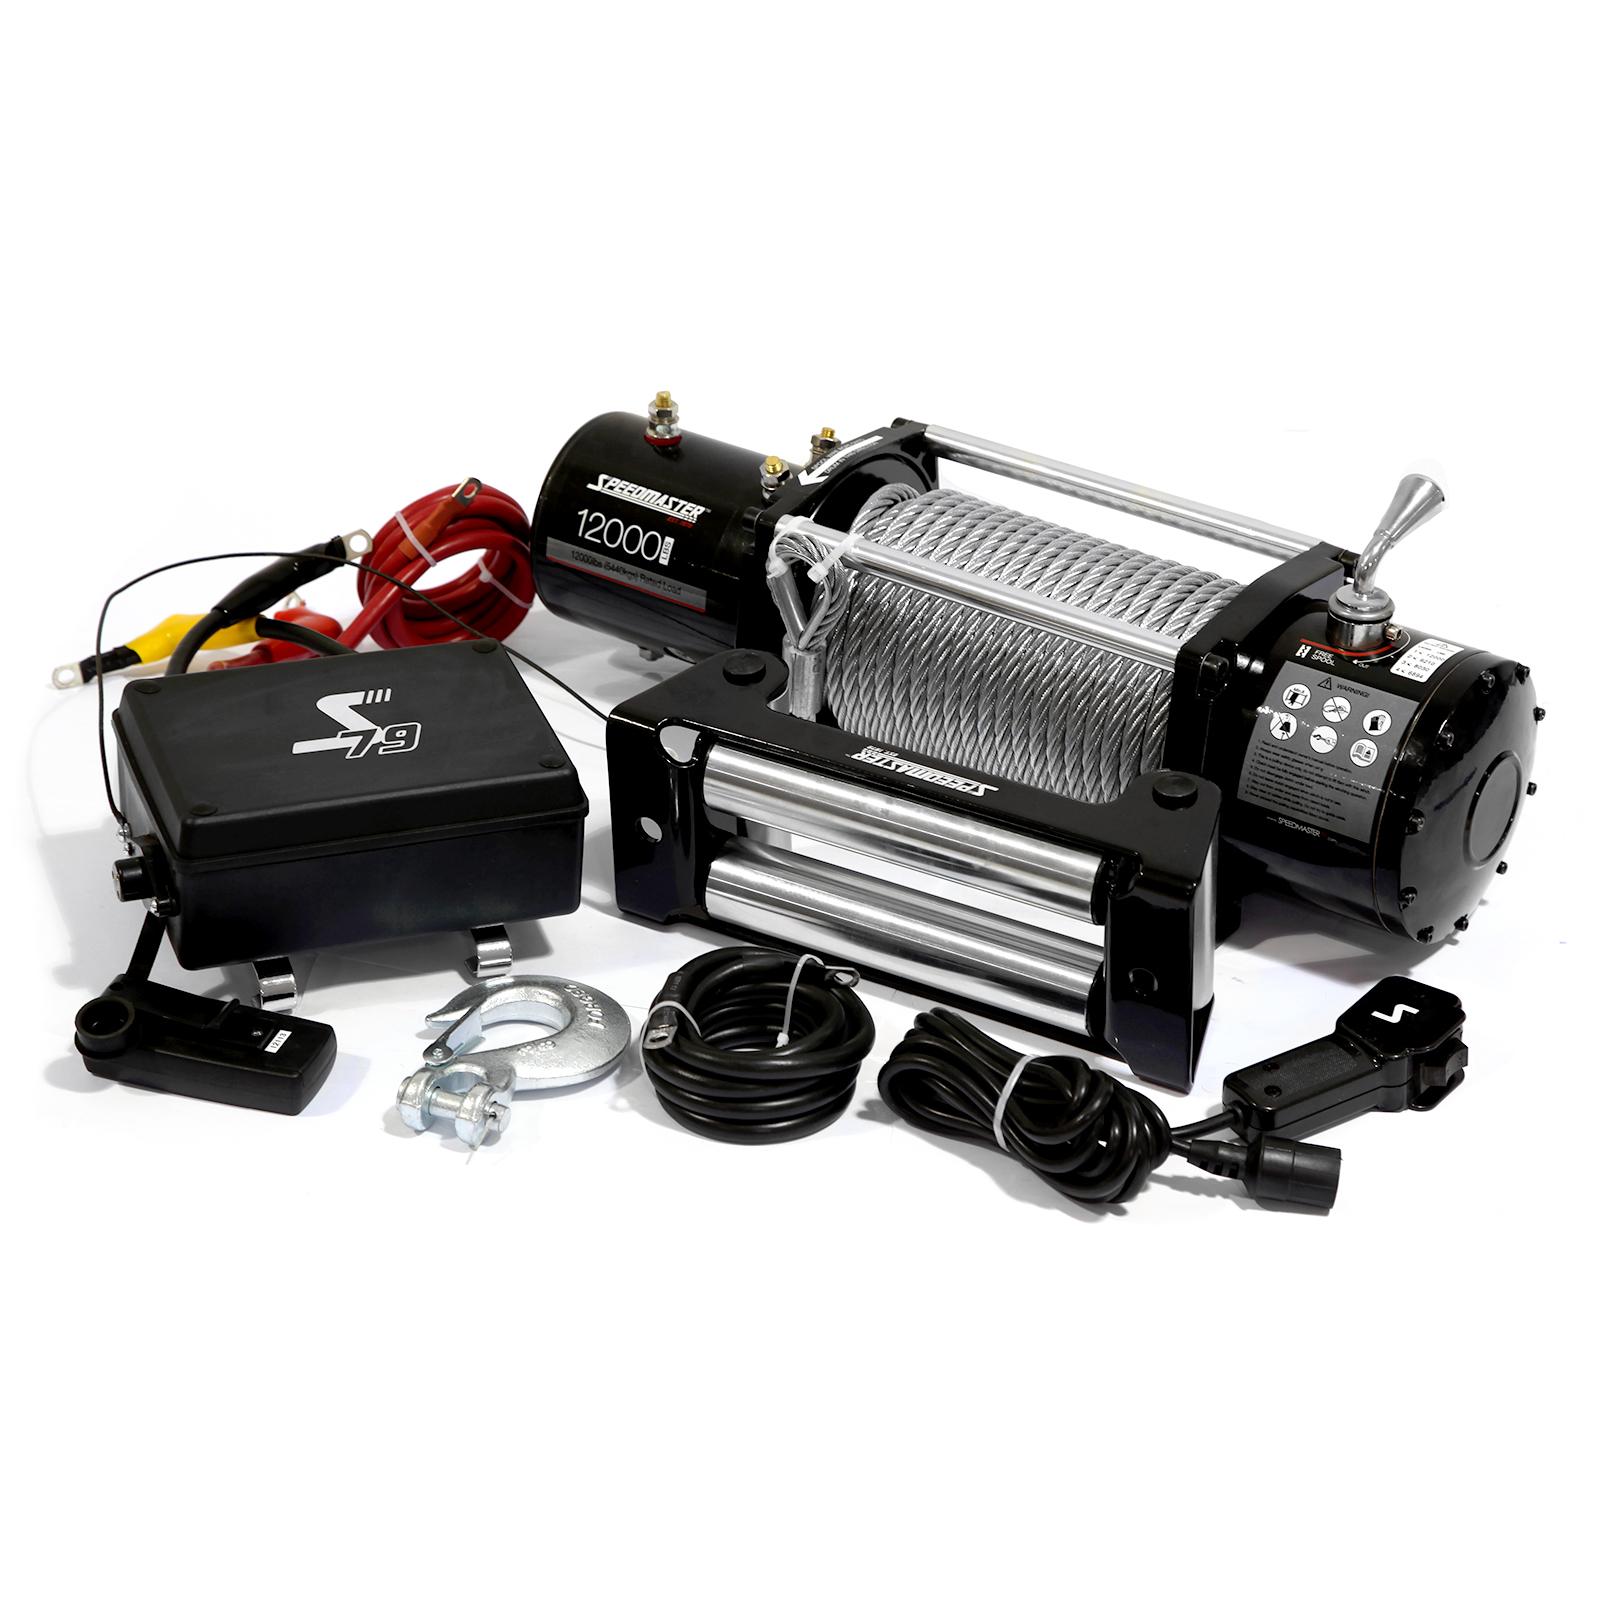 12000lbs / 5445kgs 12V Electric 4wd Winch Kit w/ Wireless Remote